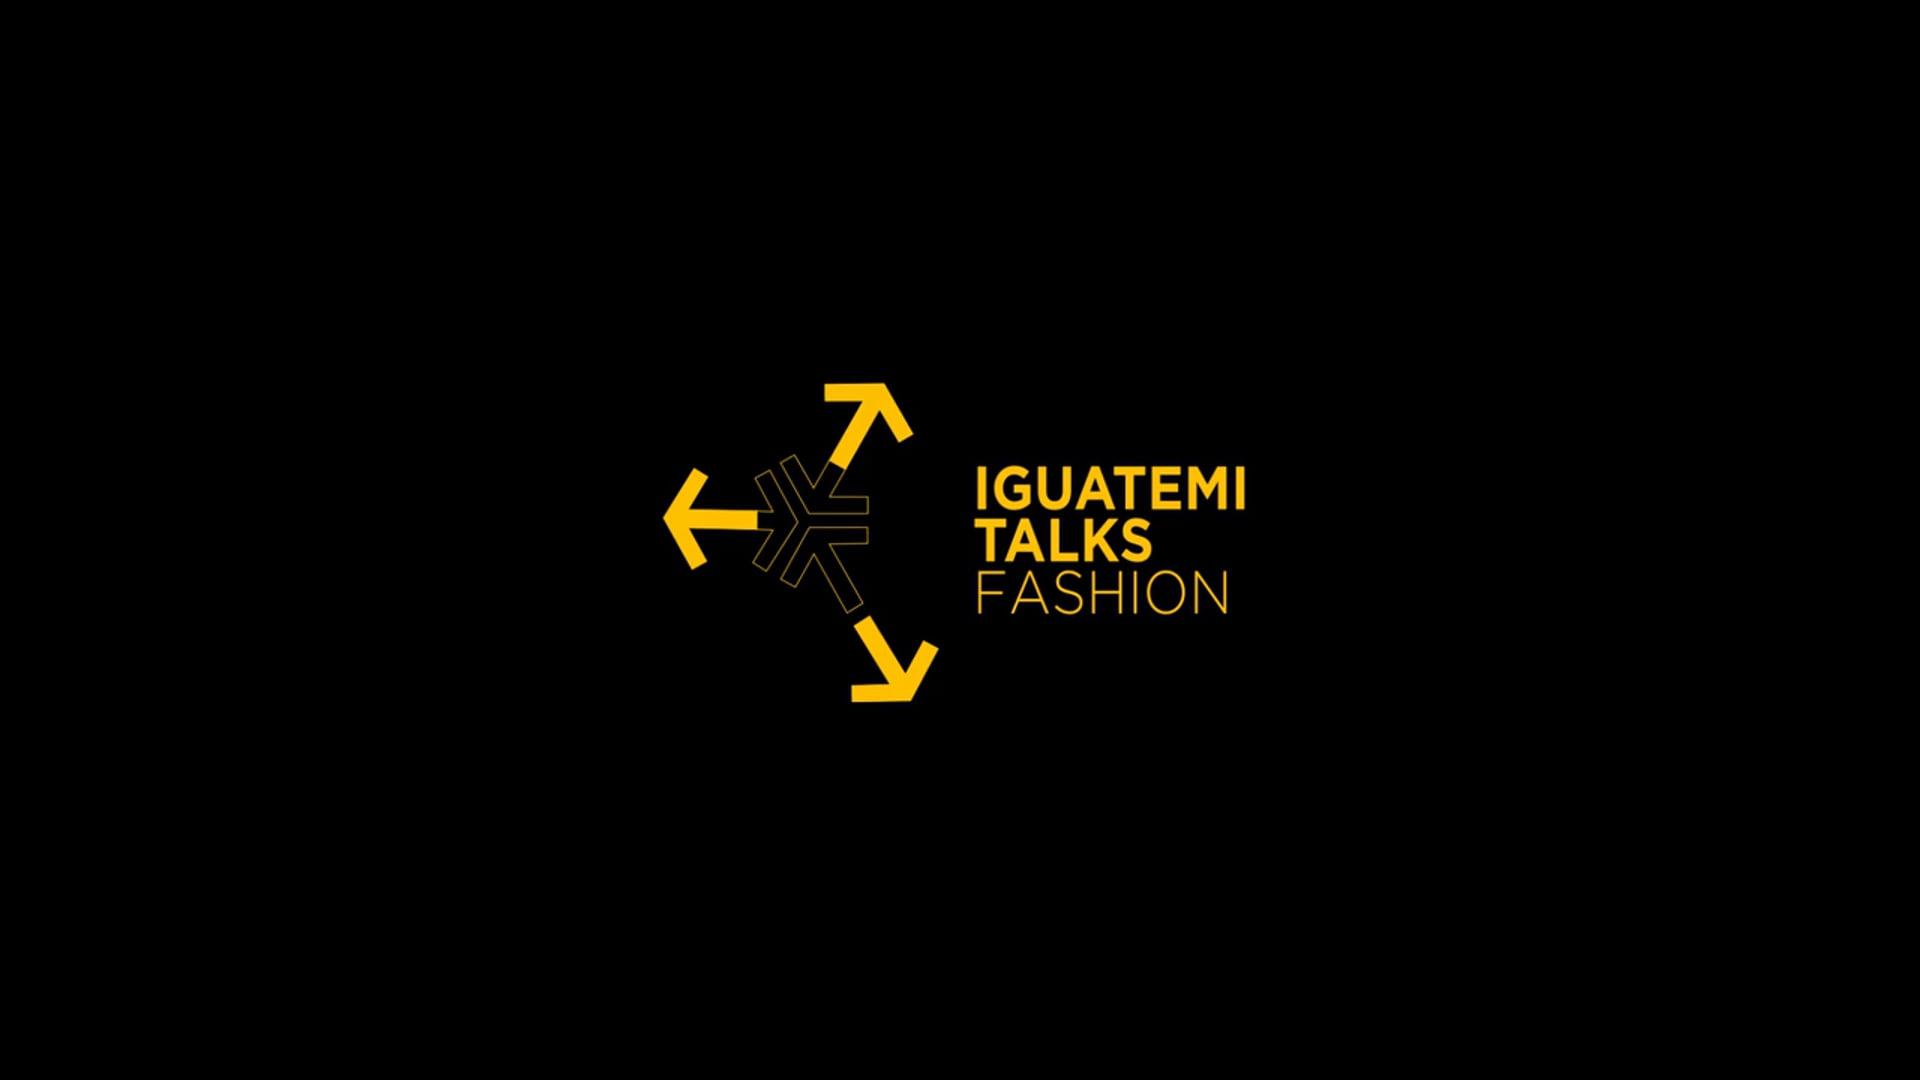 04 Iguatemi Fashion Talks